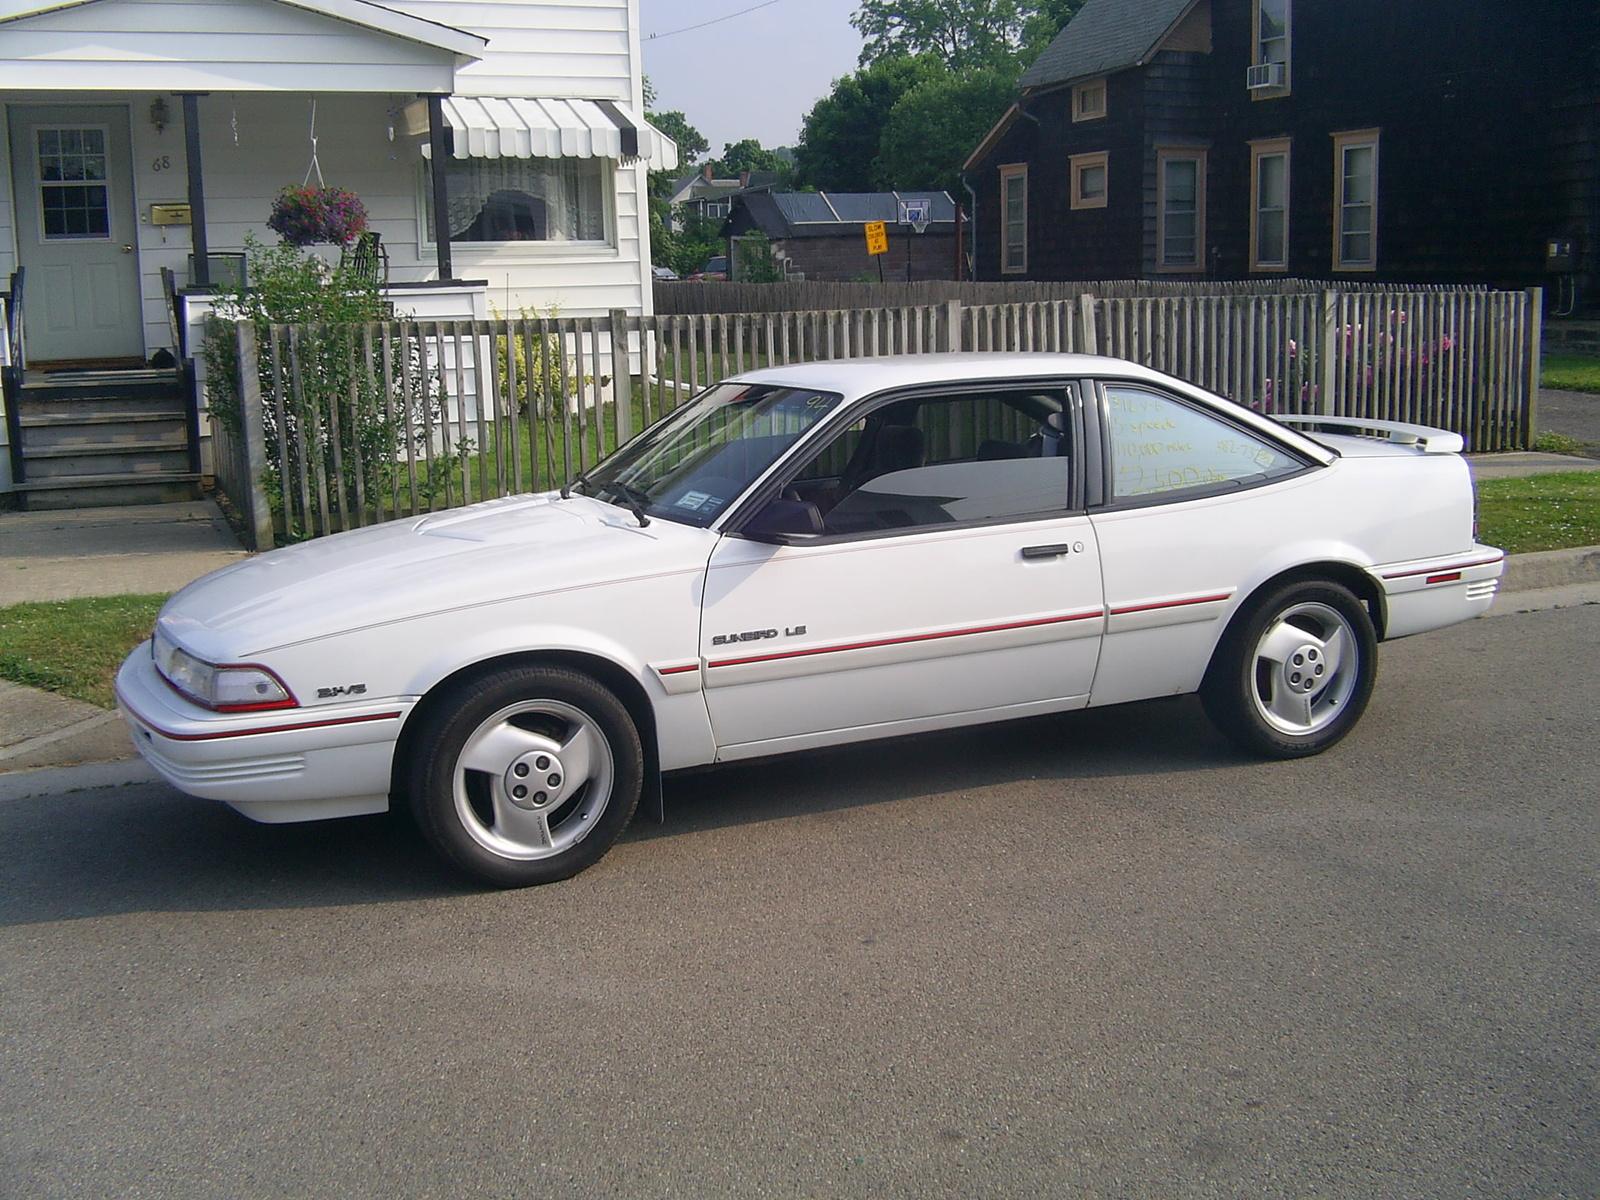 Pontiac Sunbird I 1975 - 1980 Coupe #2